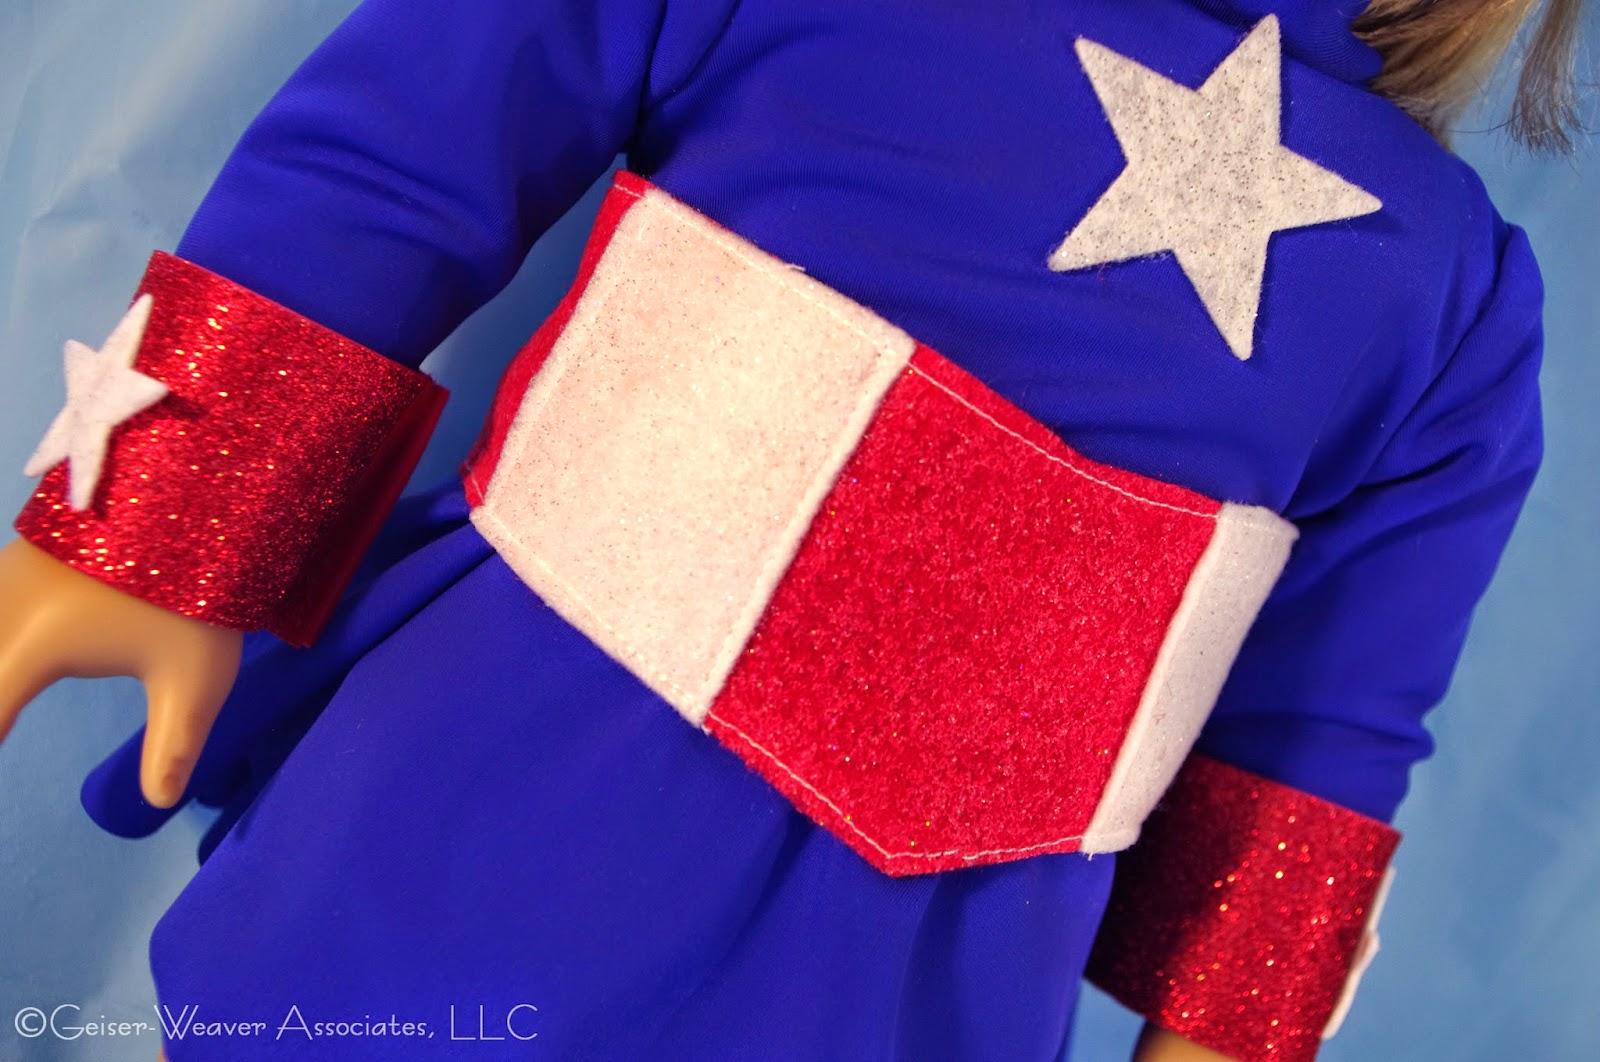 Geiser-Weaver Associates, LLC's new Captain America doll outfit